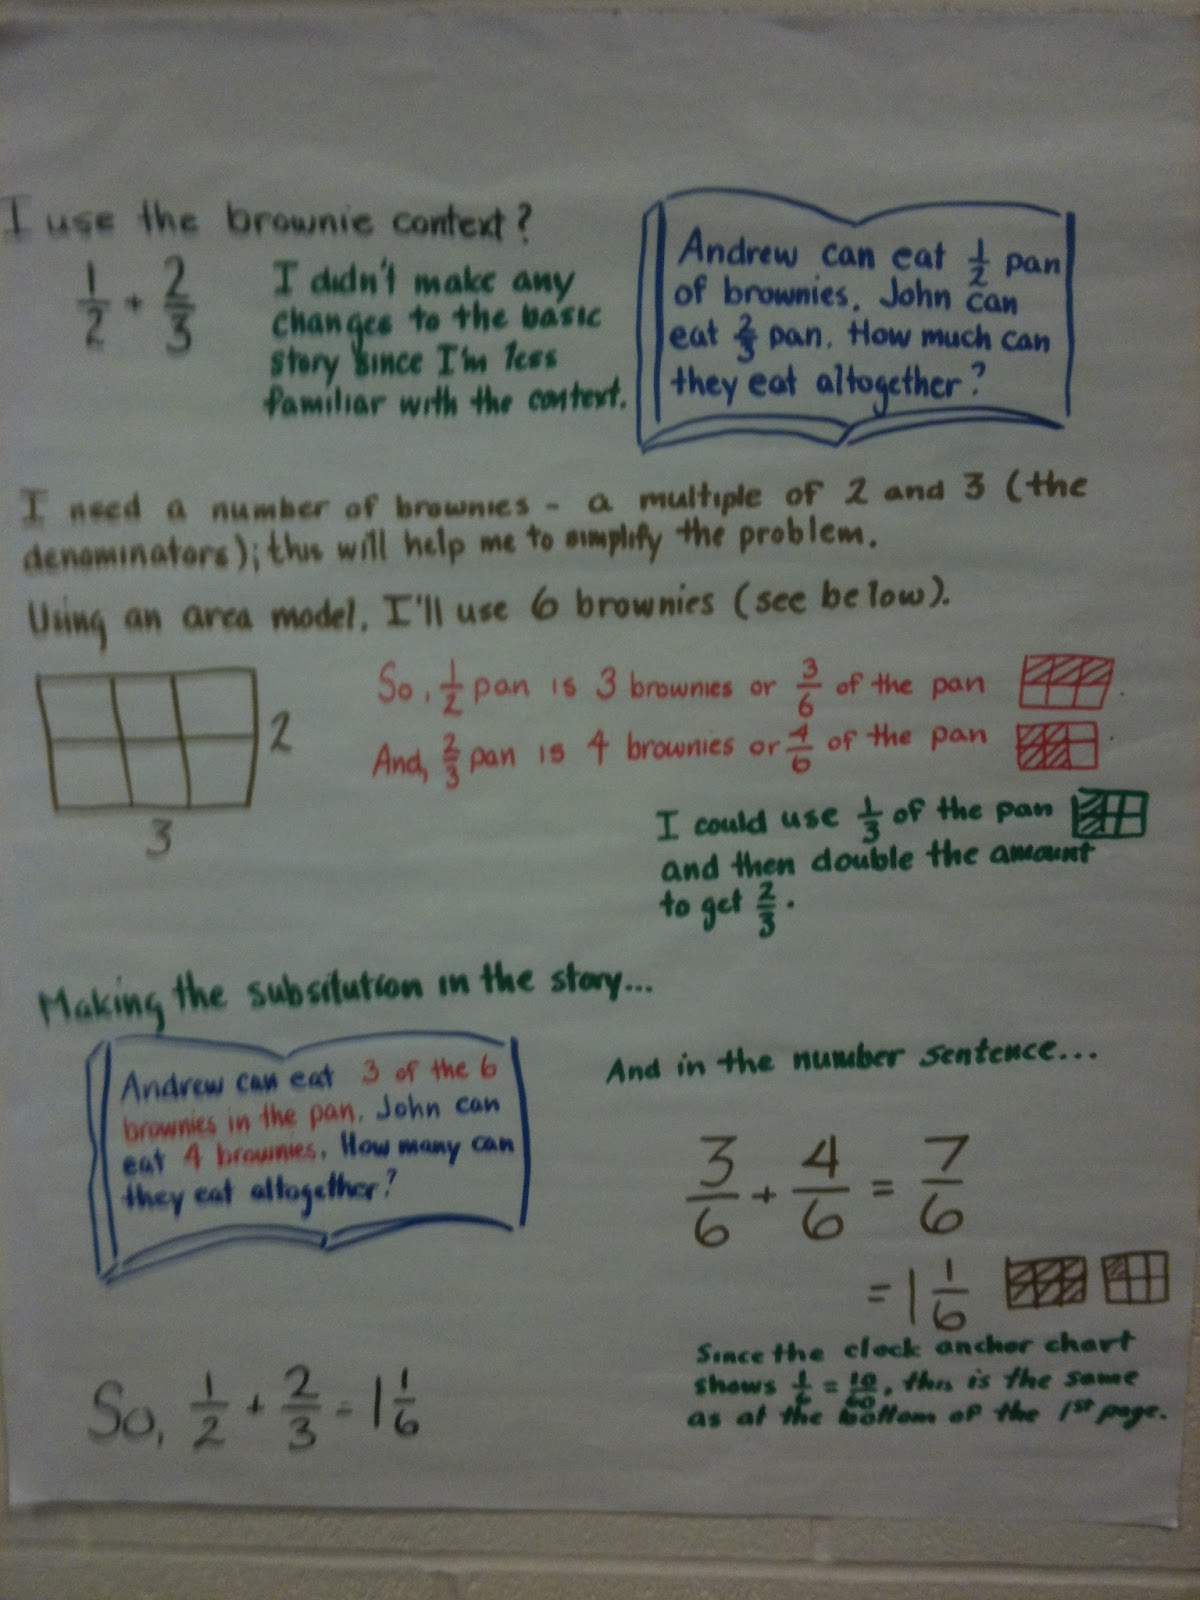 Worksheet Fraction Attraction Worksheet fraction attraction worksheet 32 delta scape june 20111000 math 2011 32